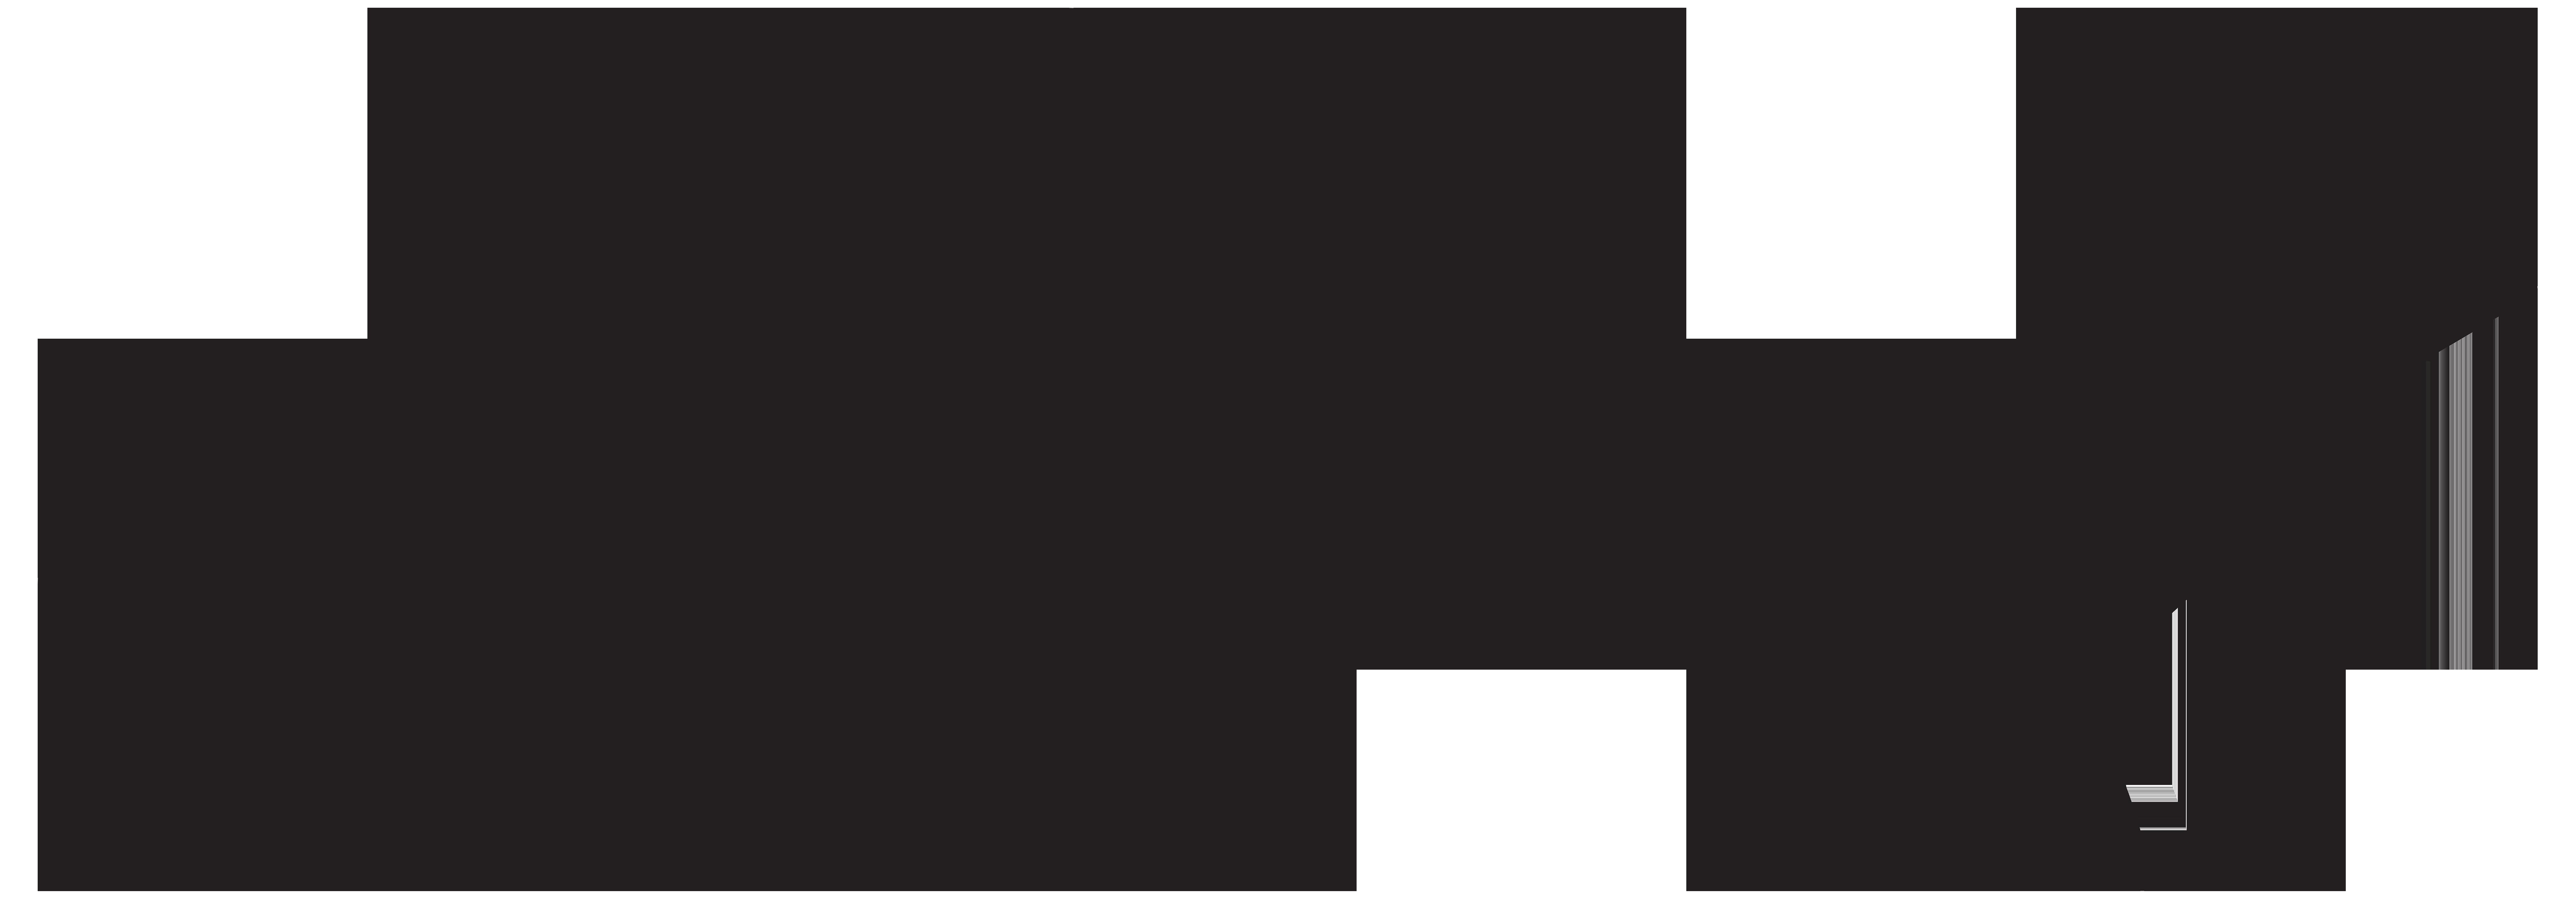 clip library Great white silhouette clip. Sharks clipart bull shark